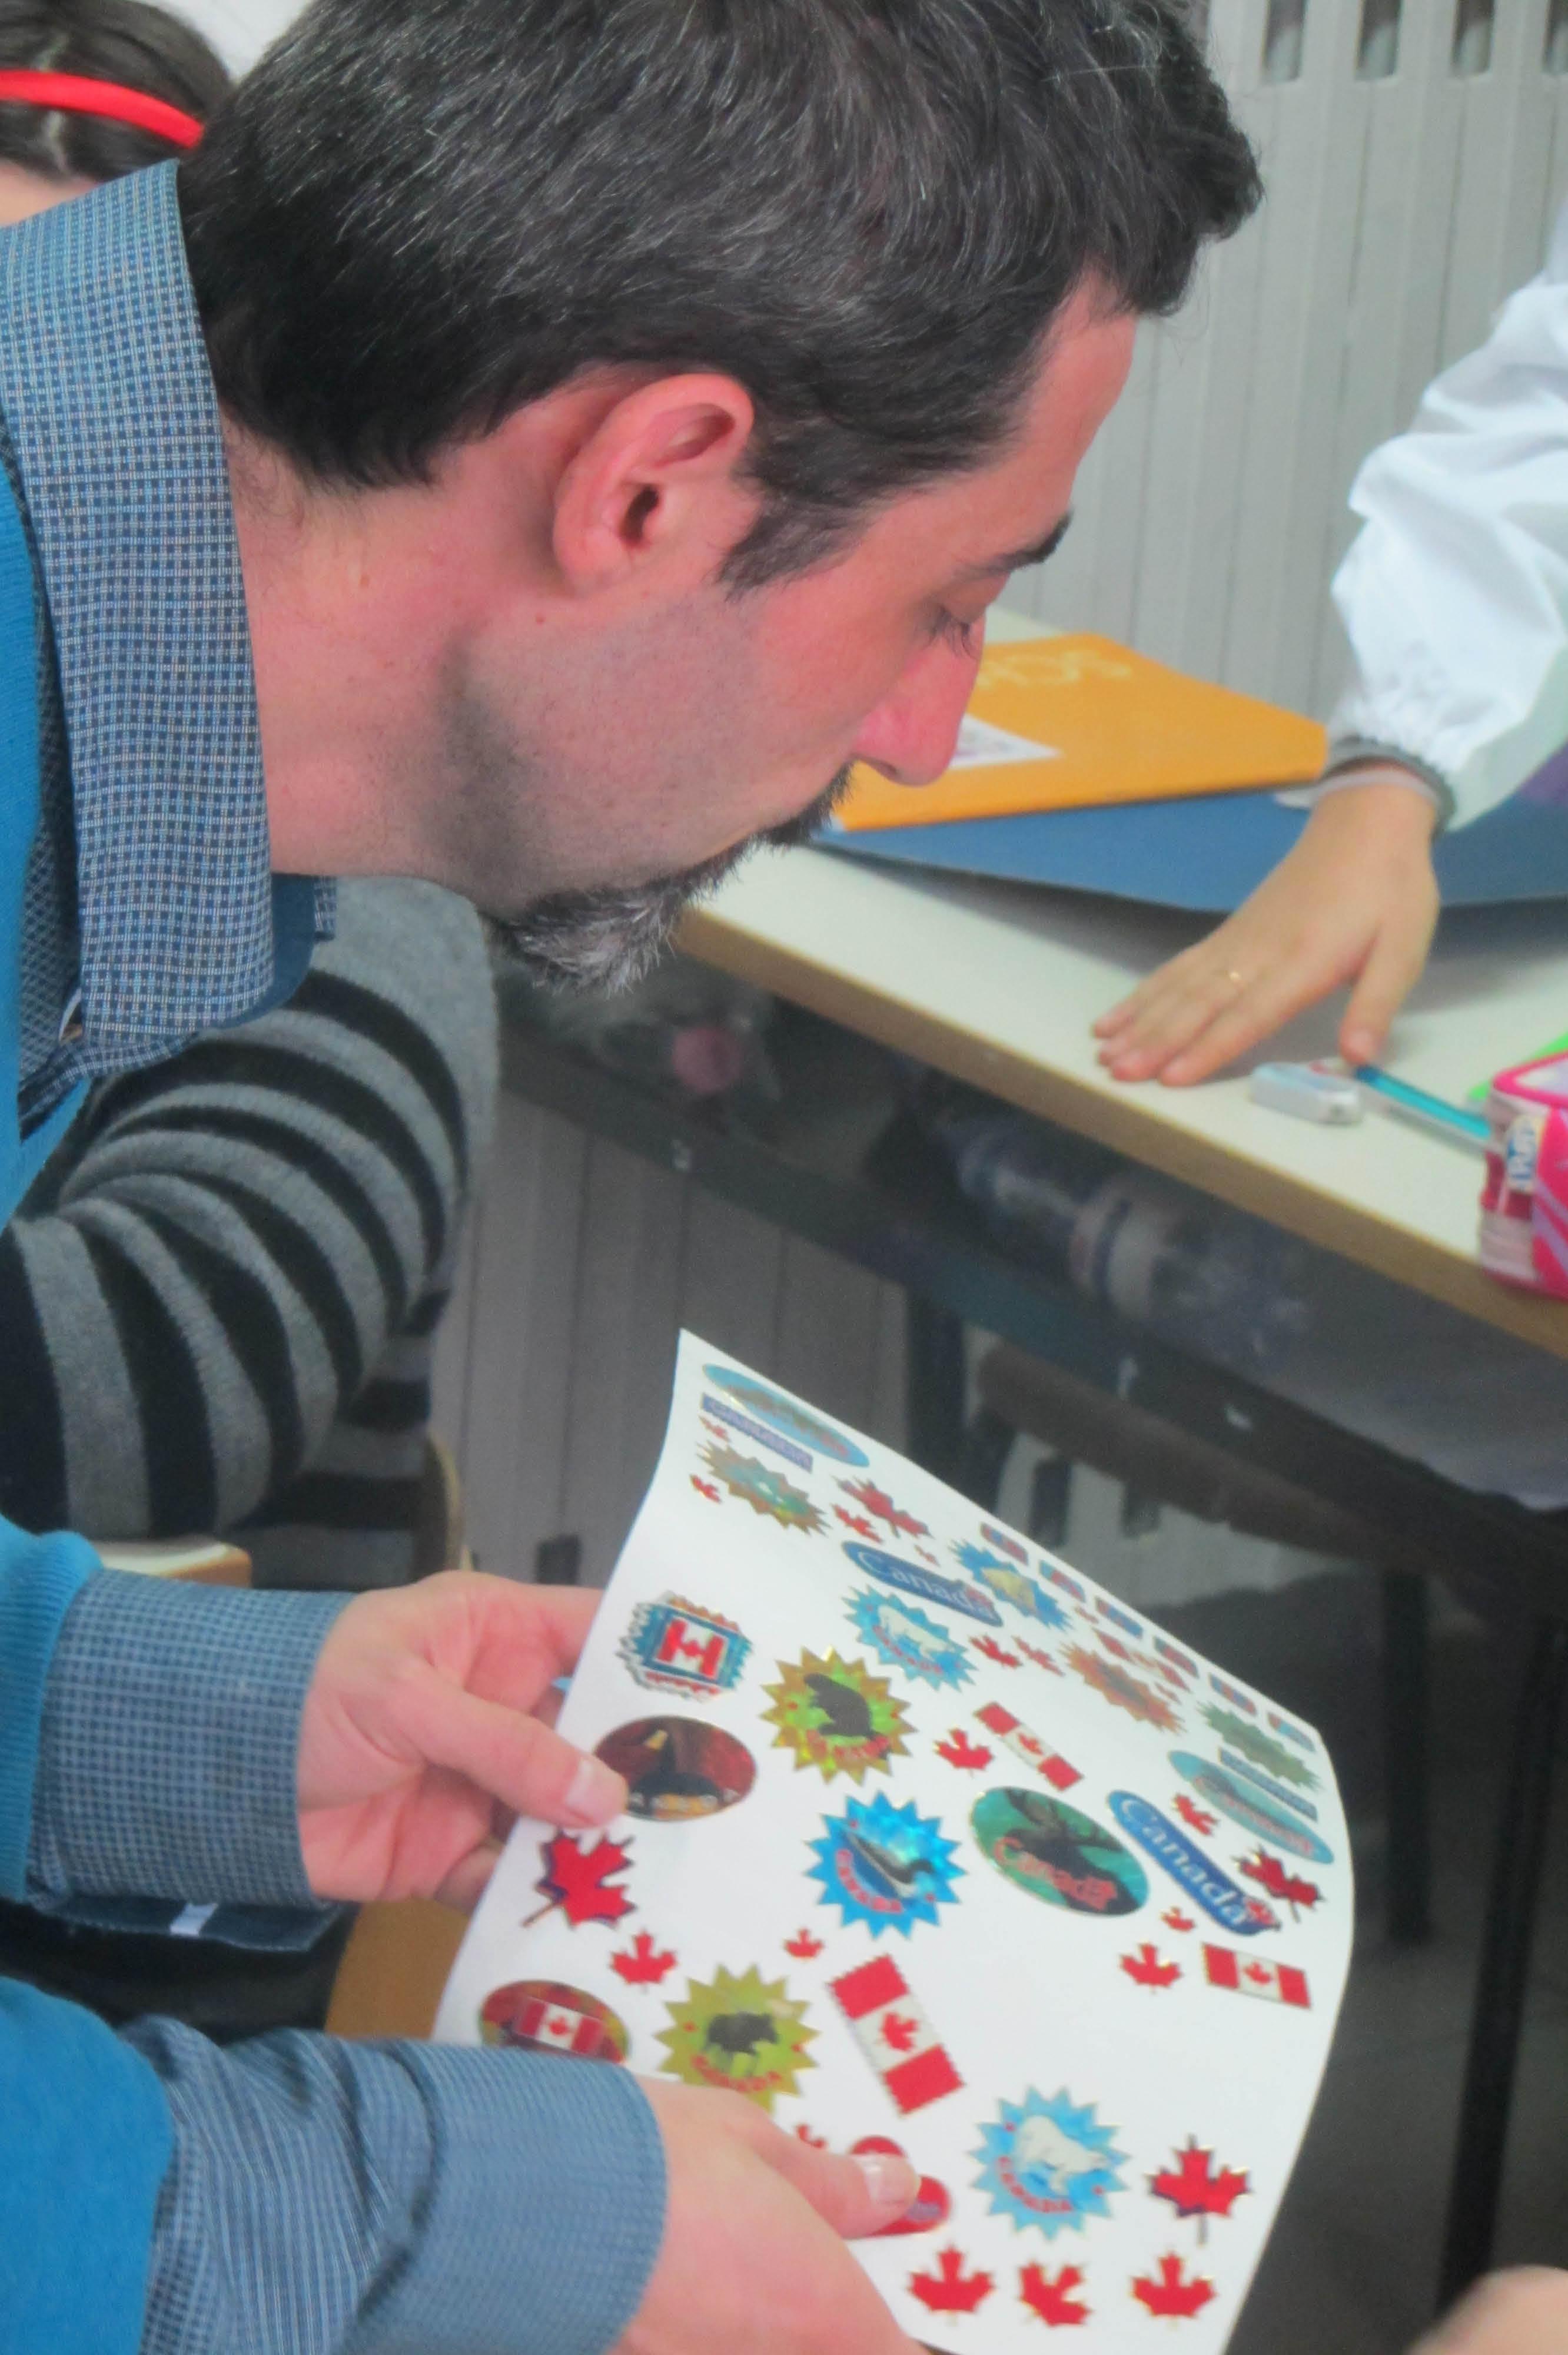 Benedict School Pomigliano d'Arco @ Somma18